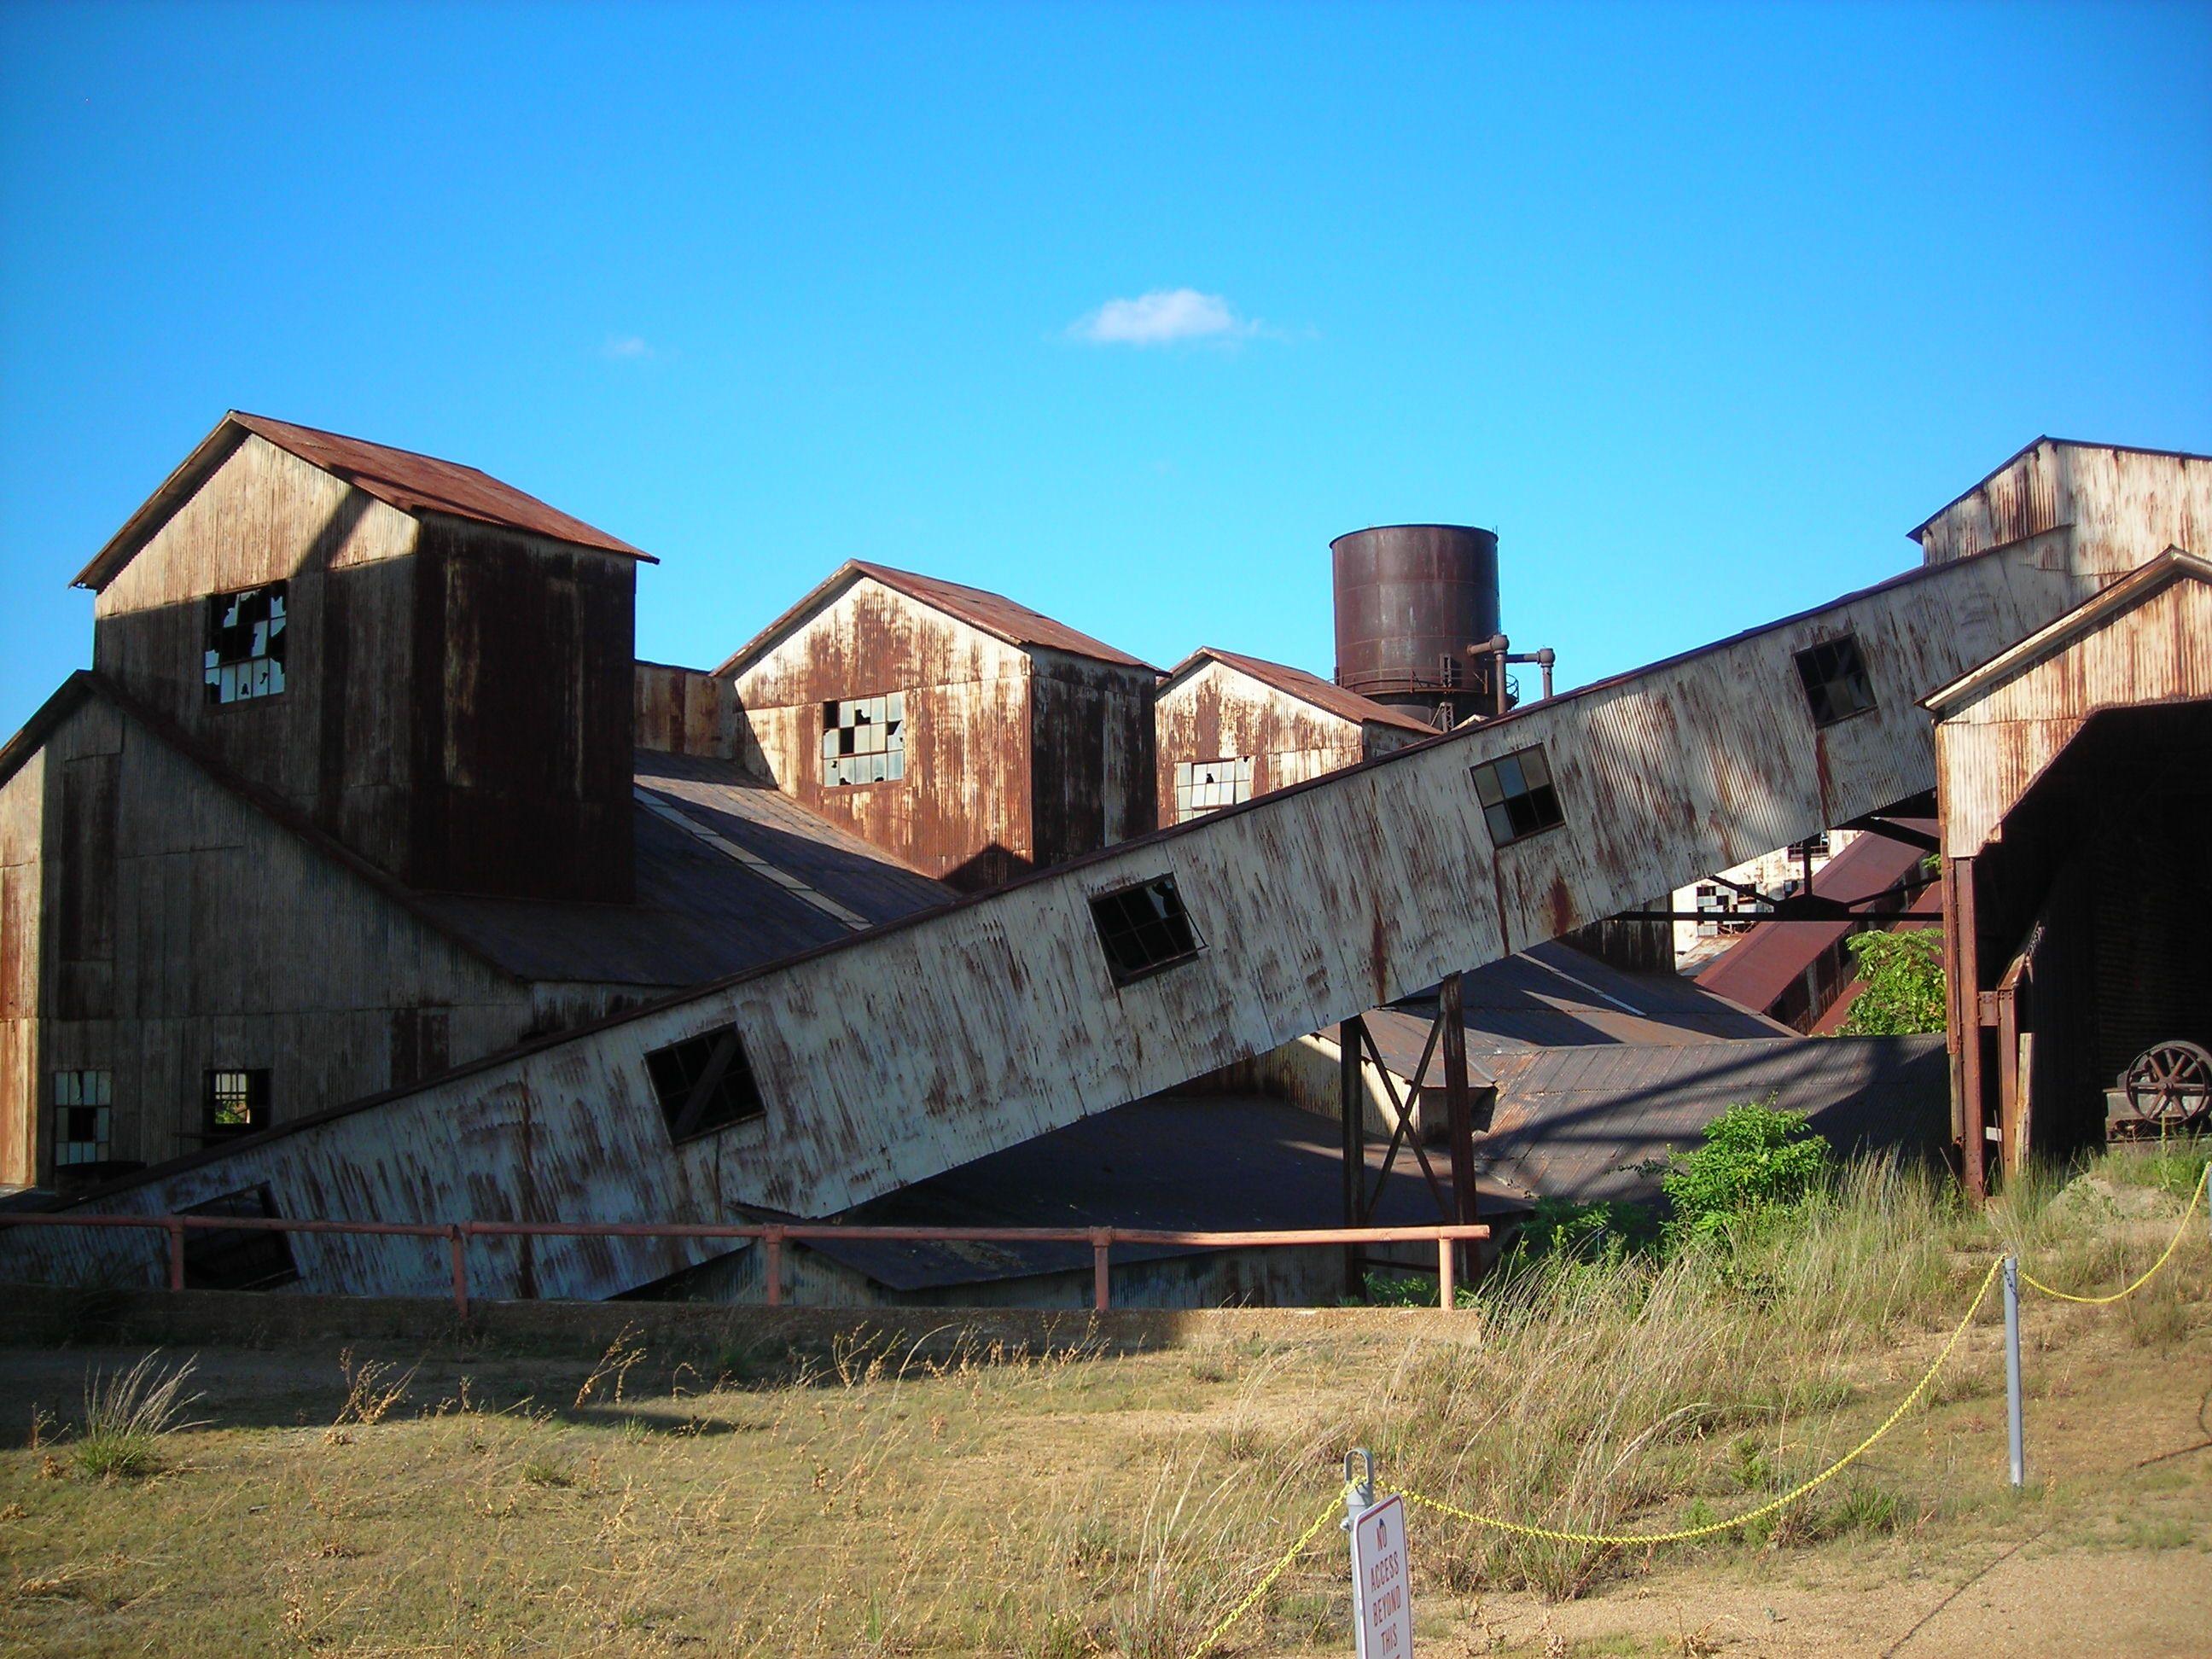 Old Bonne Terre mines, MO, USA | TRAVEL | Pinterest | Abandoned ...